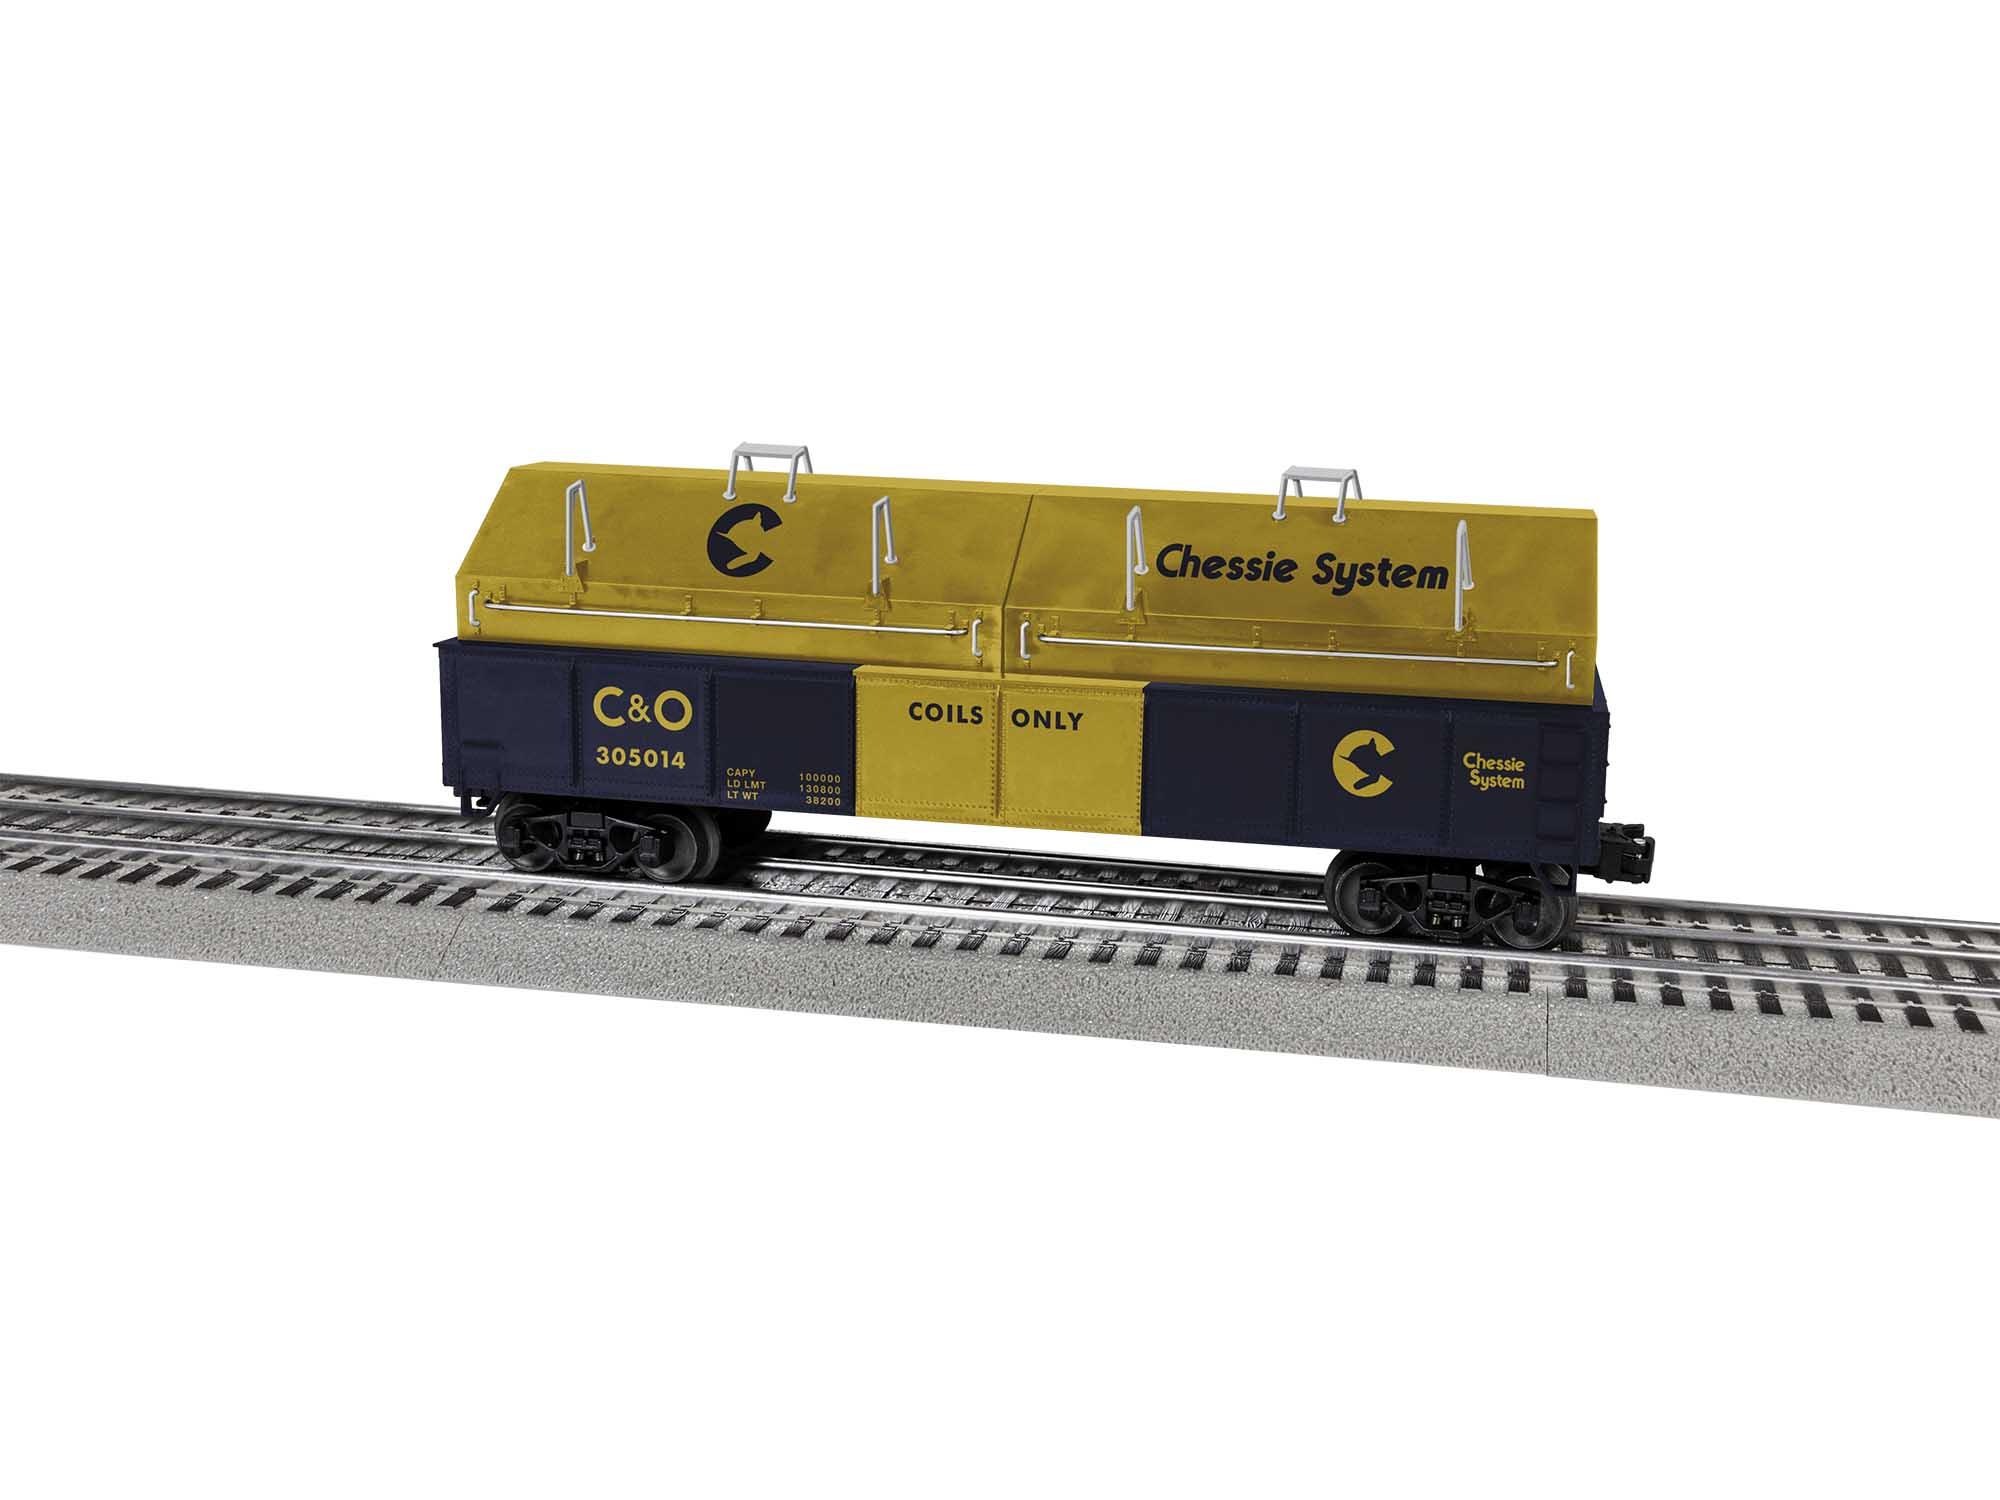 Lionel 2043142 O Gondola Chessie System #305014